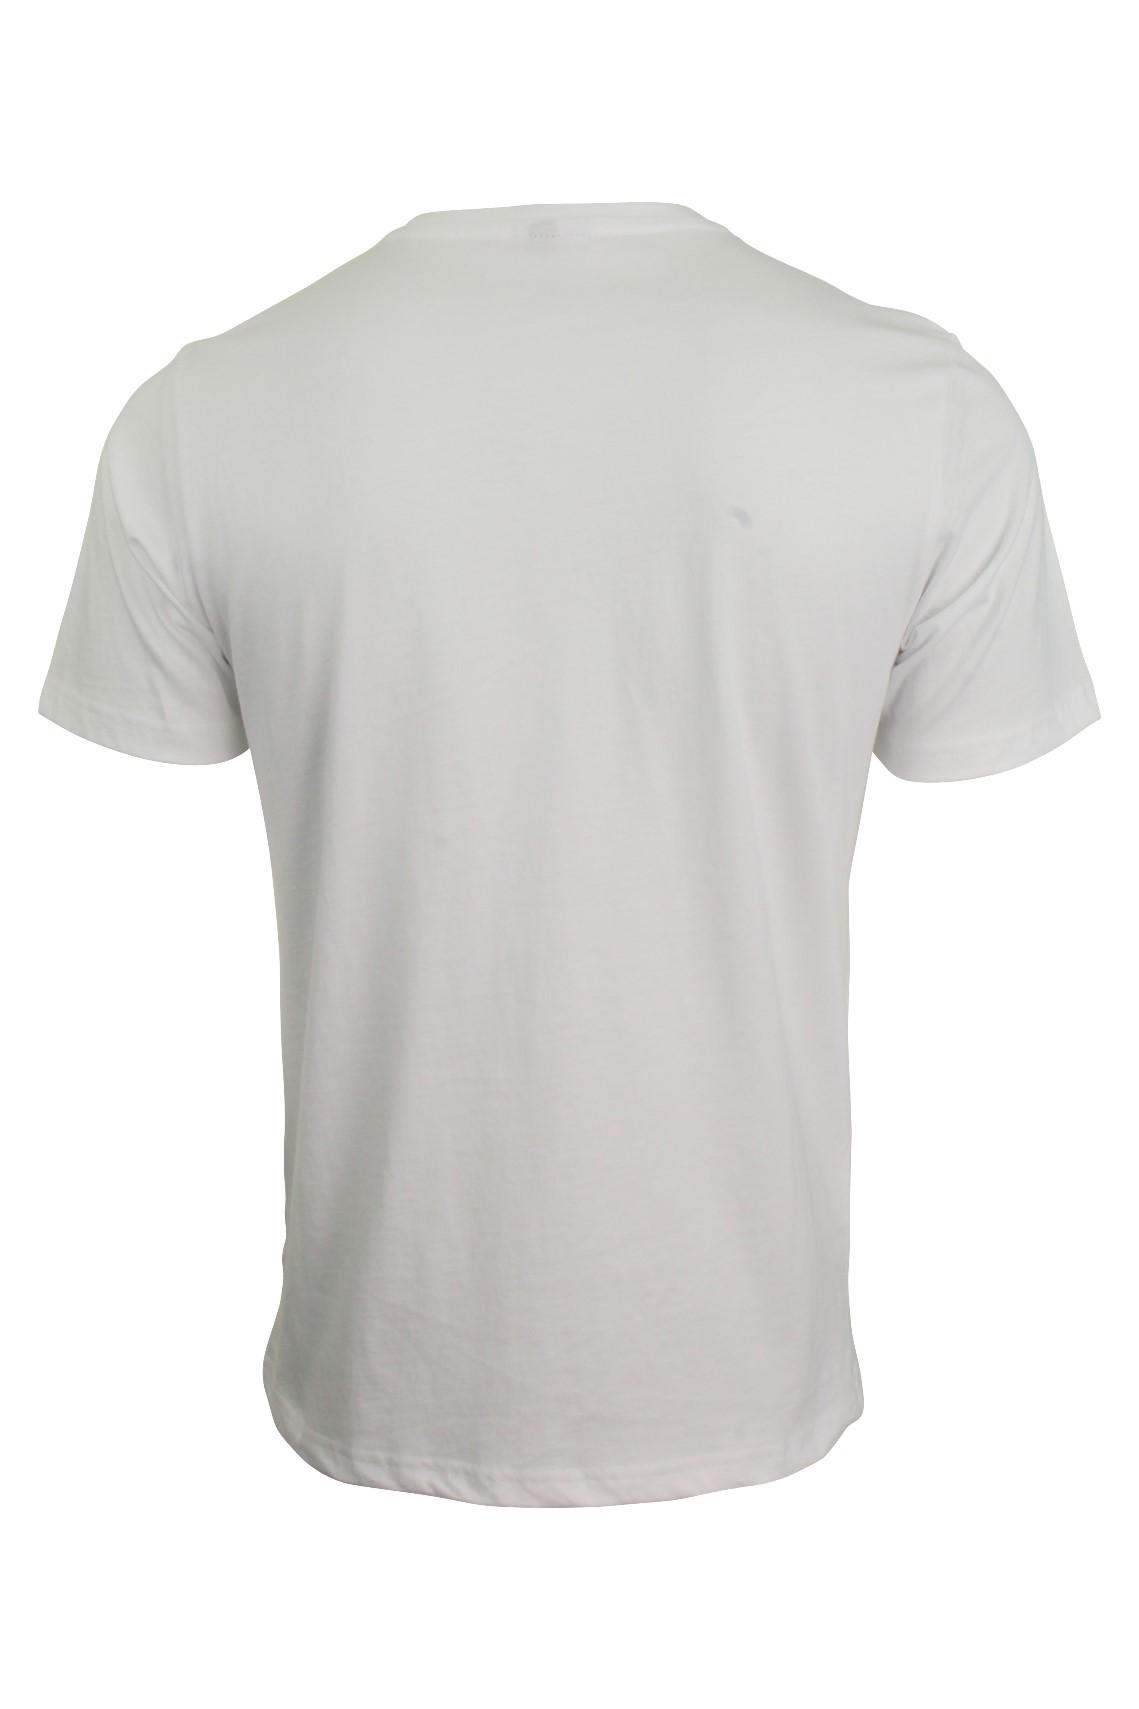 Mens-Ellesse-T-Shirt-039-Prado-039-Short-Sleeved thumbnail 20